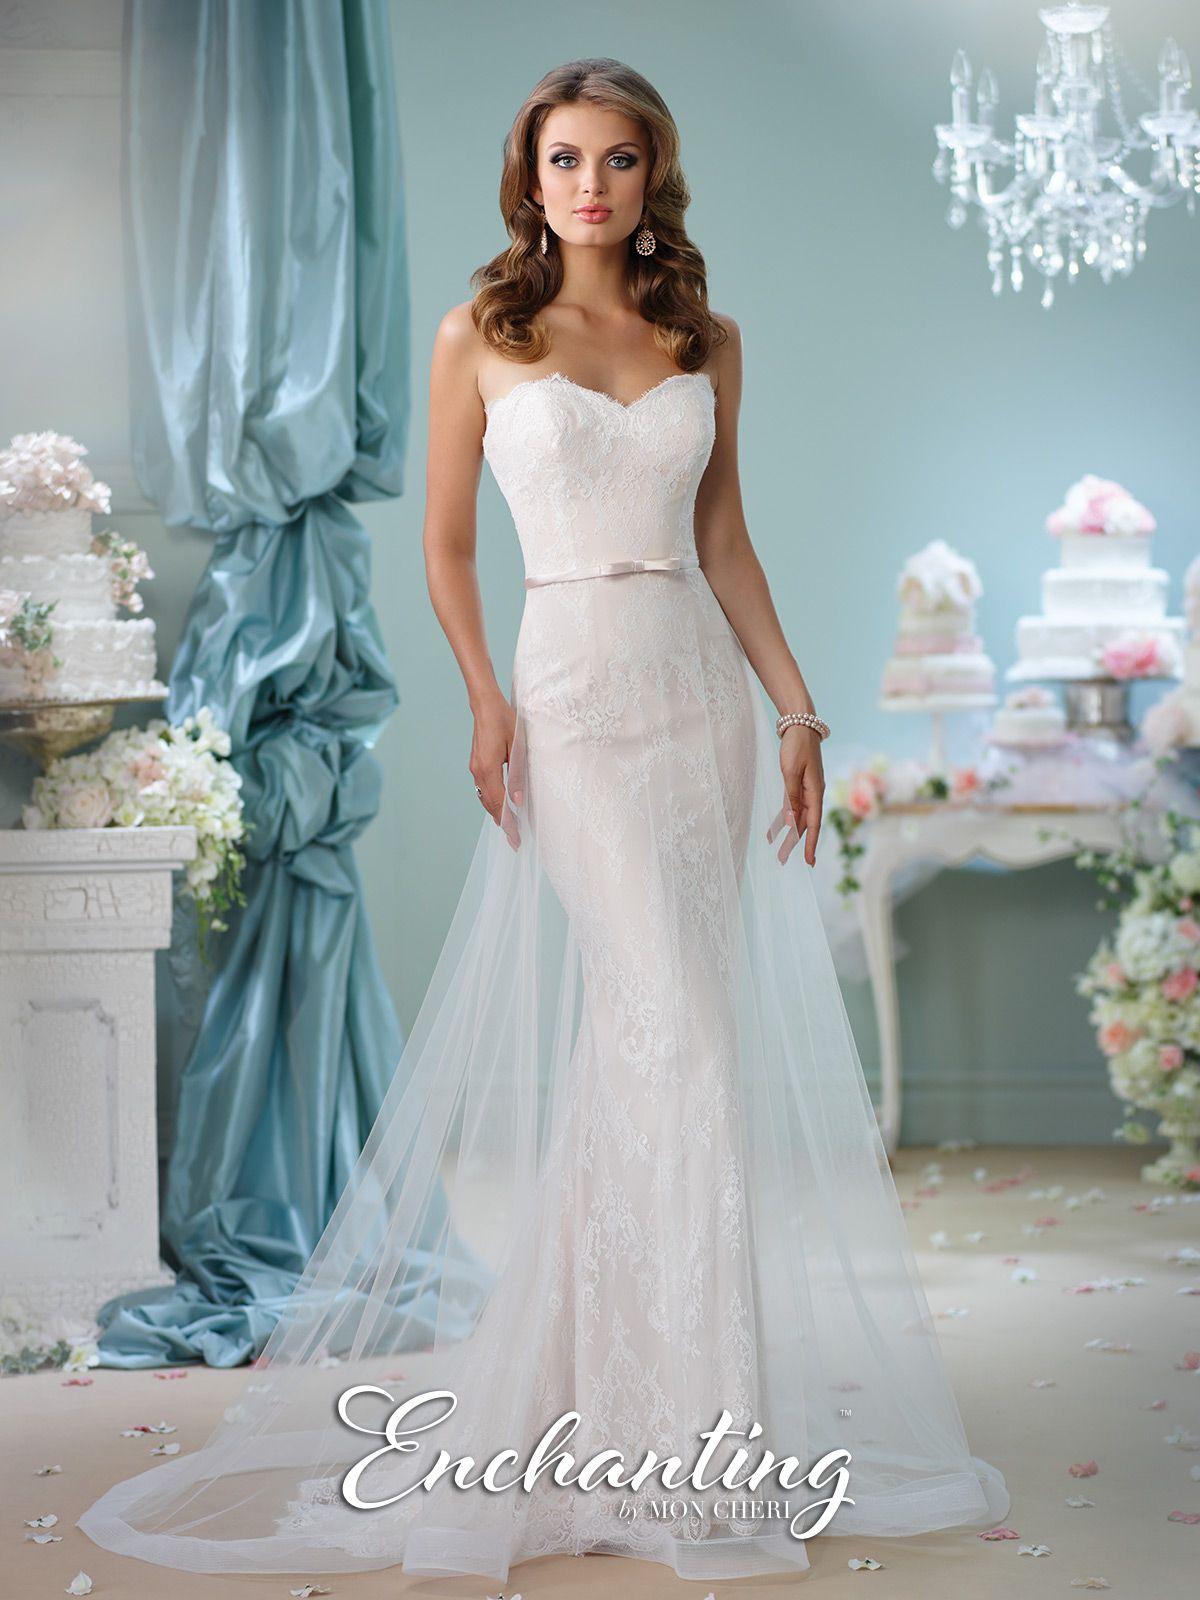 Sweetheart Cage Wedding Dress- 116134- Enchanting by Mon Cheri